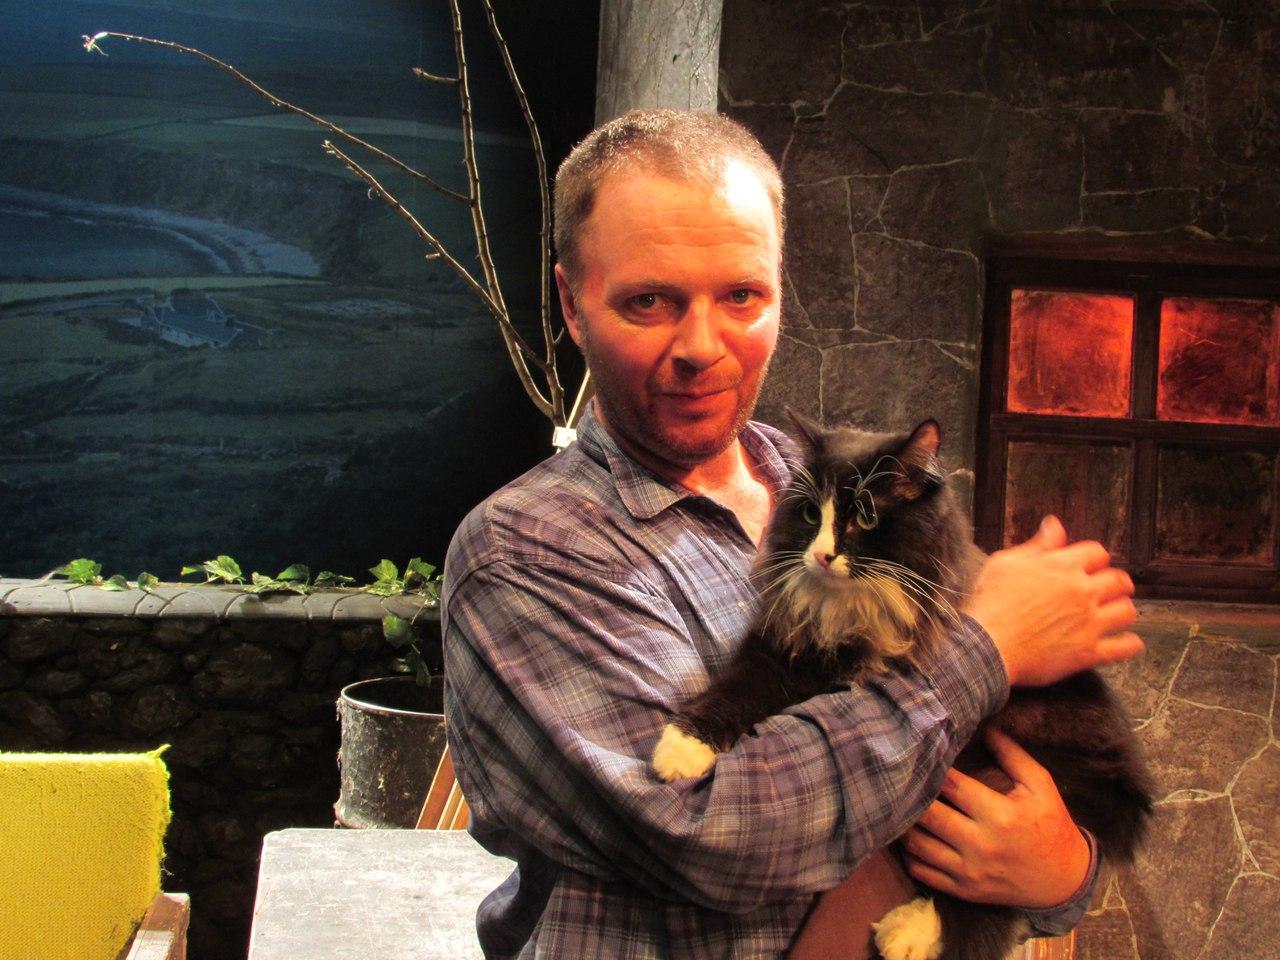 O ator Vladímir Ilin, que interpreta o tenente, com o gato Semion.